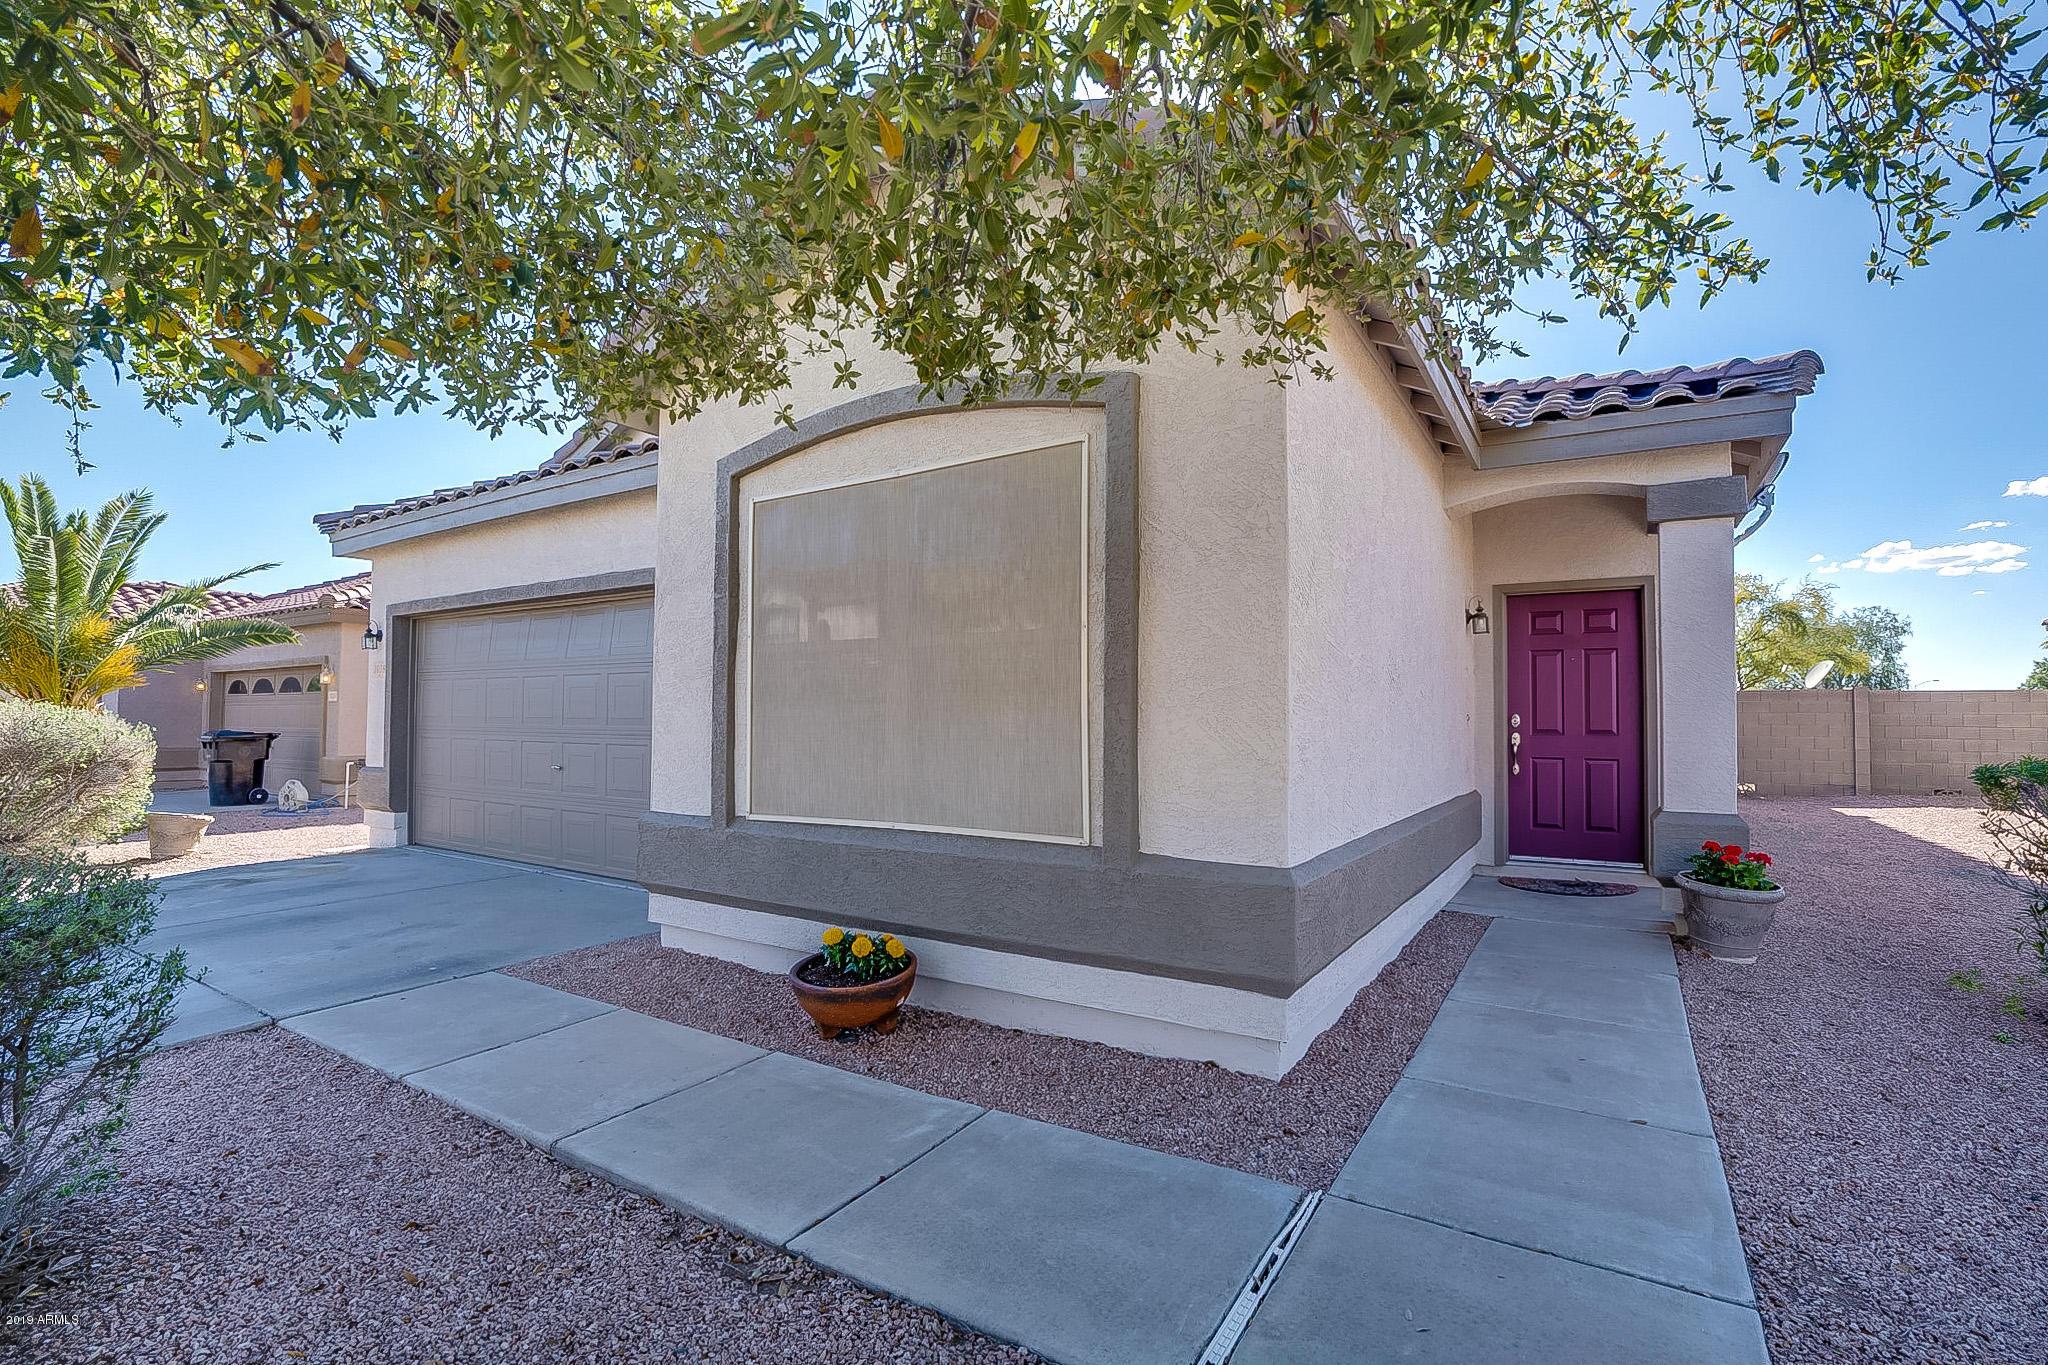 Photo of 1018 S Clancy Circle, Mesa, AZ 85208